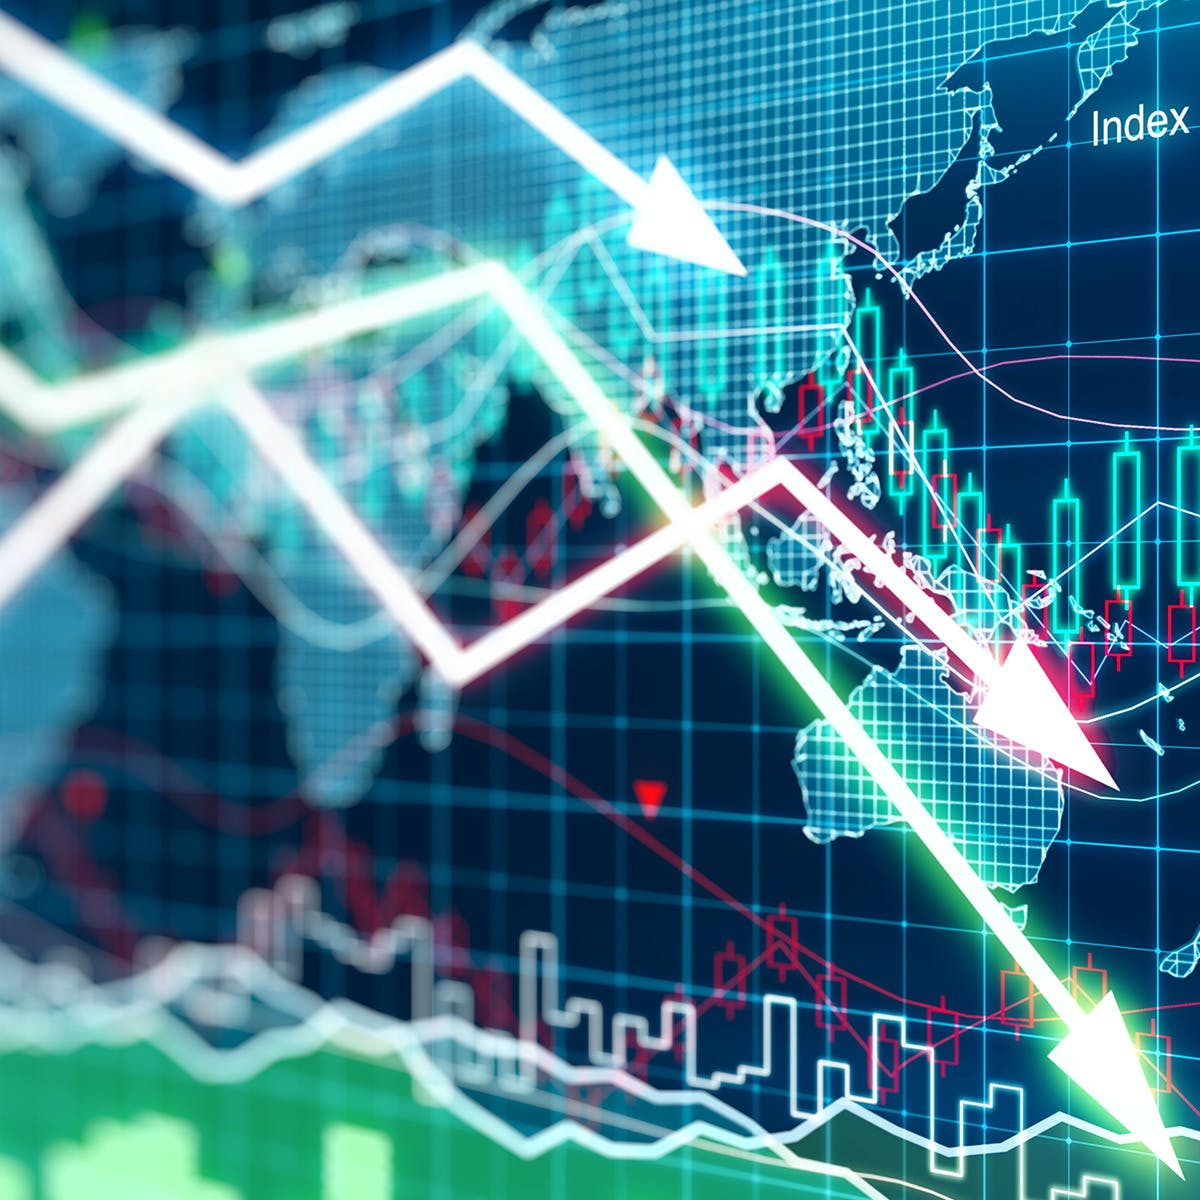 Strategic Business Management - Macroeconomics